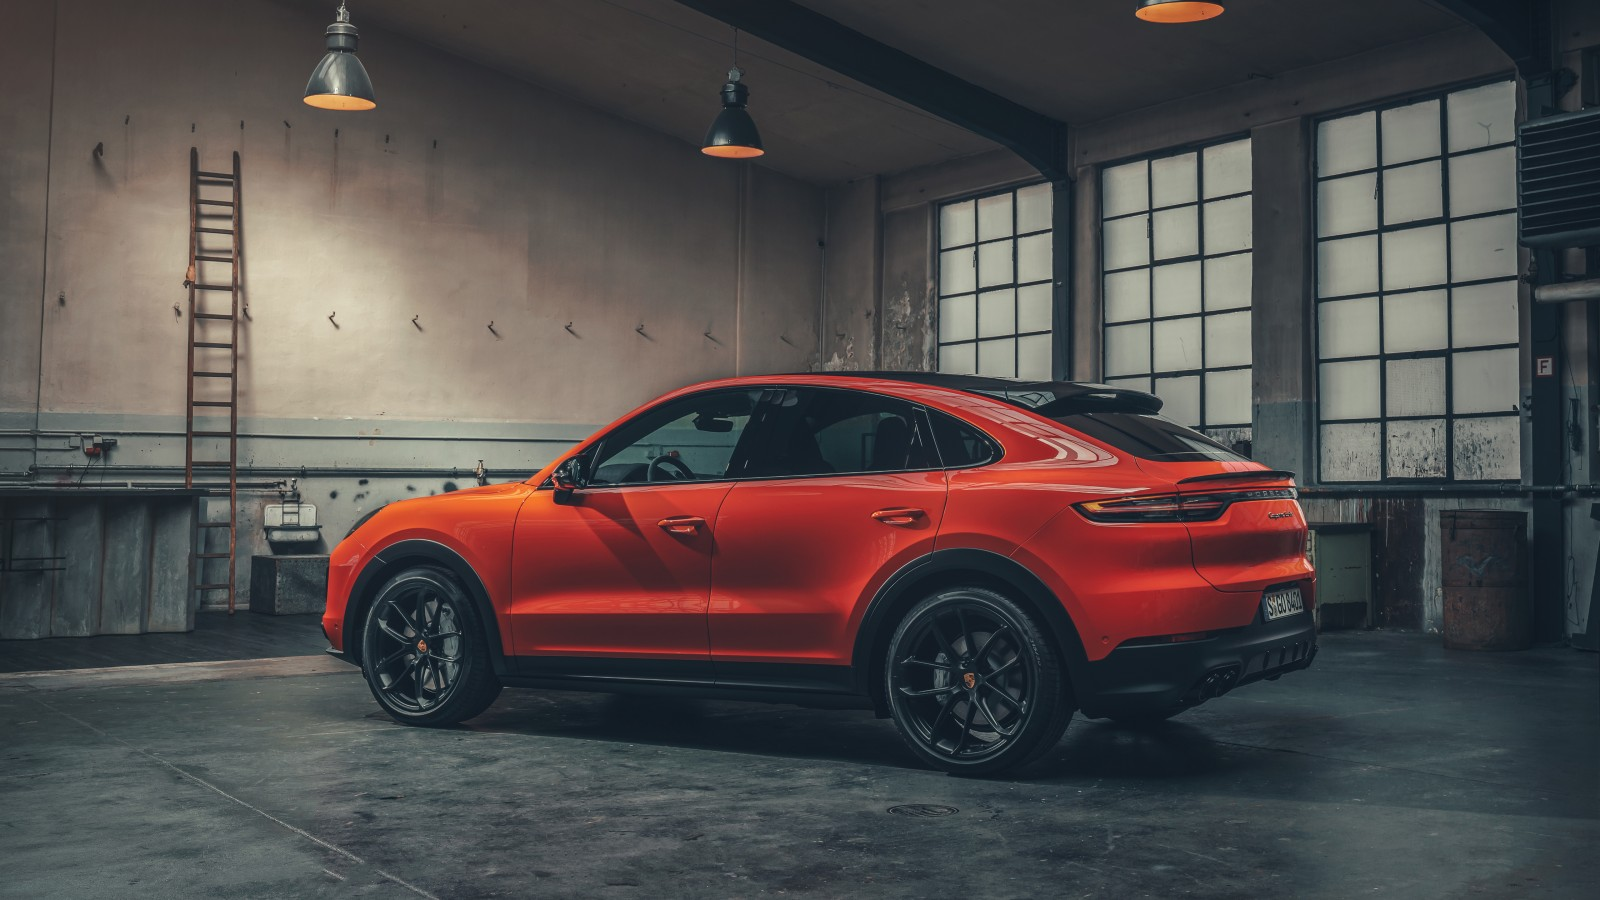 Iphone X Bmw Wallpaper Porsche Cayenne Turbo Coupe 2019 4k 2 Wallpaper Hd Car